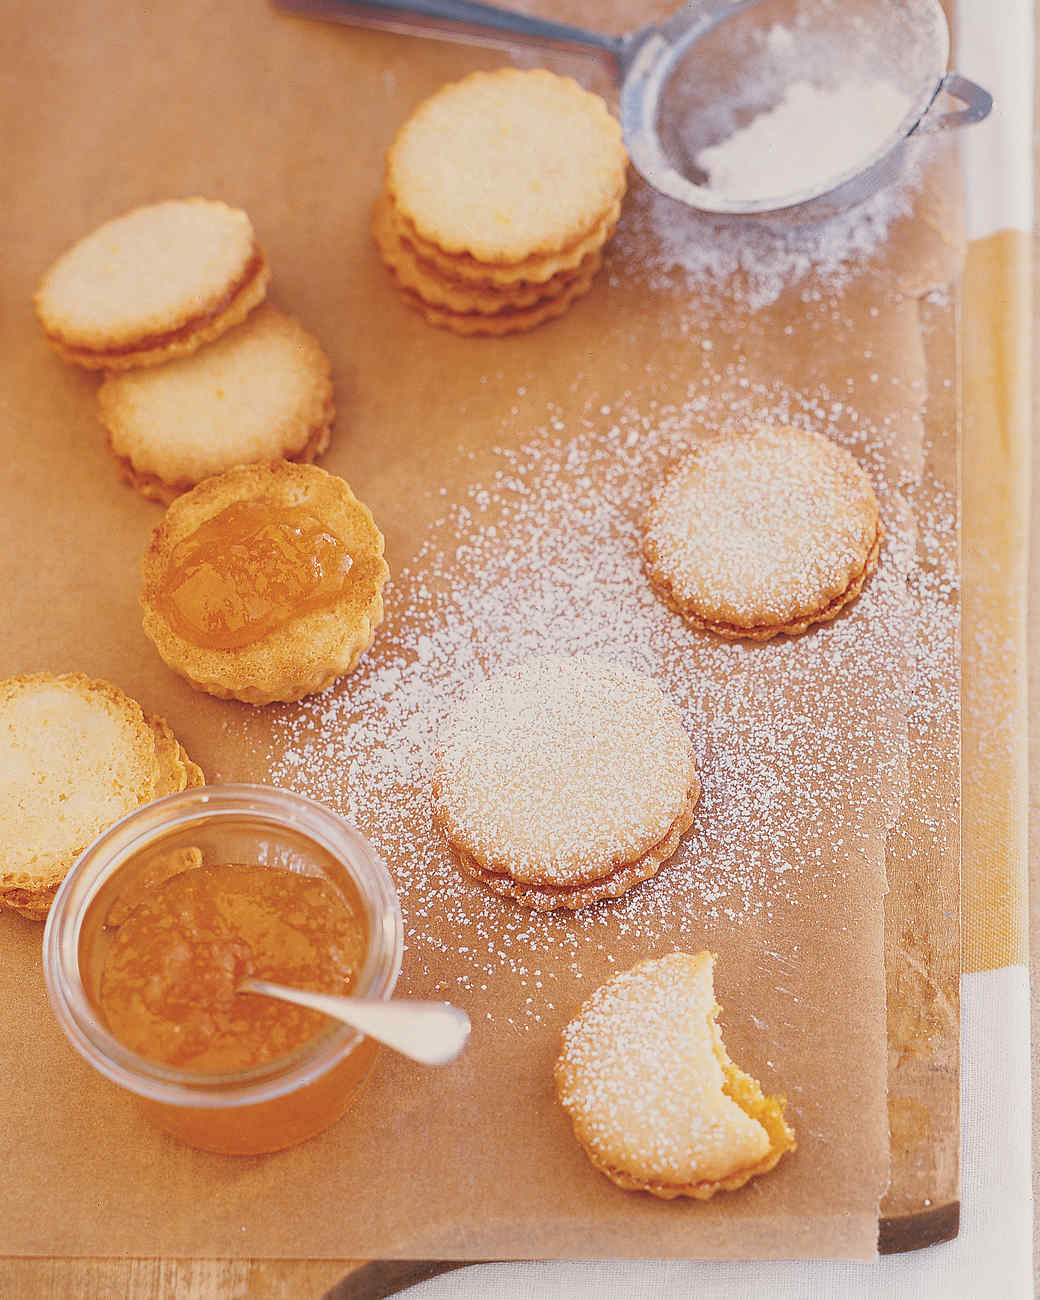 Lemon-Apricot Sandwiches